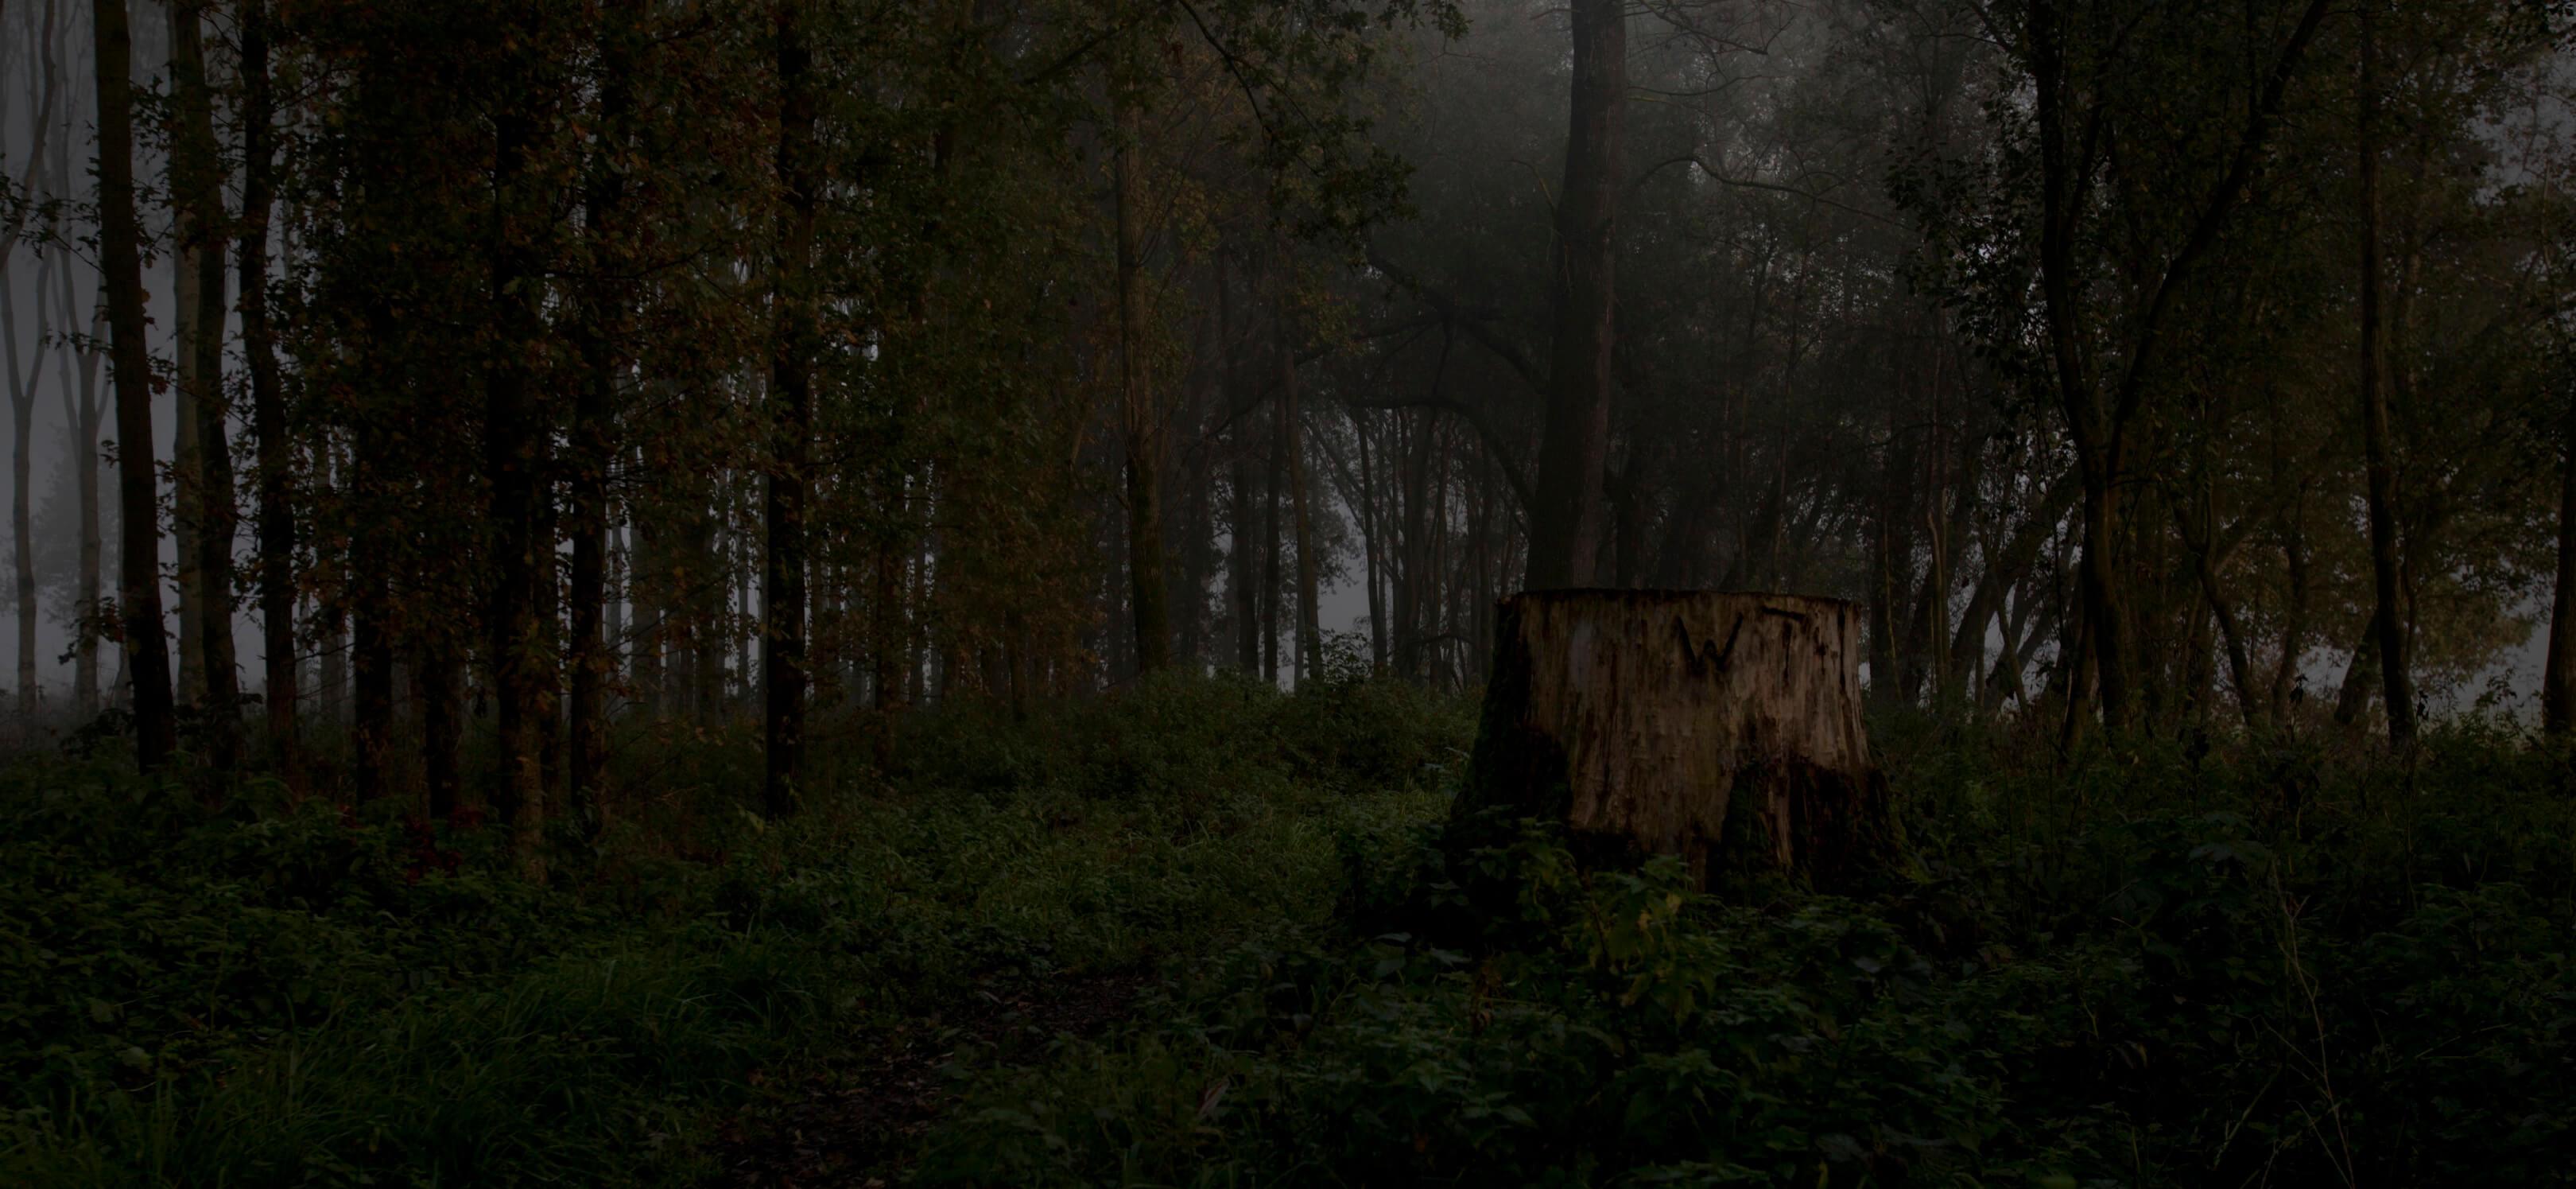 Jur Jurjen Poeles fotografie fragment landschap from dusk till dawn duister ochtendgloren dageraad vrijwerk vrij werk kunst kunstfotografie boomstronk mistig bos